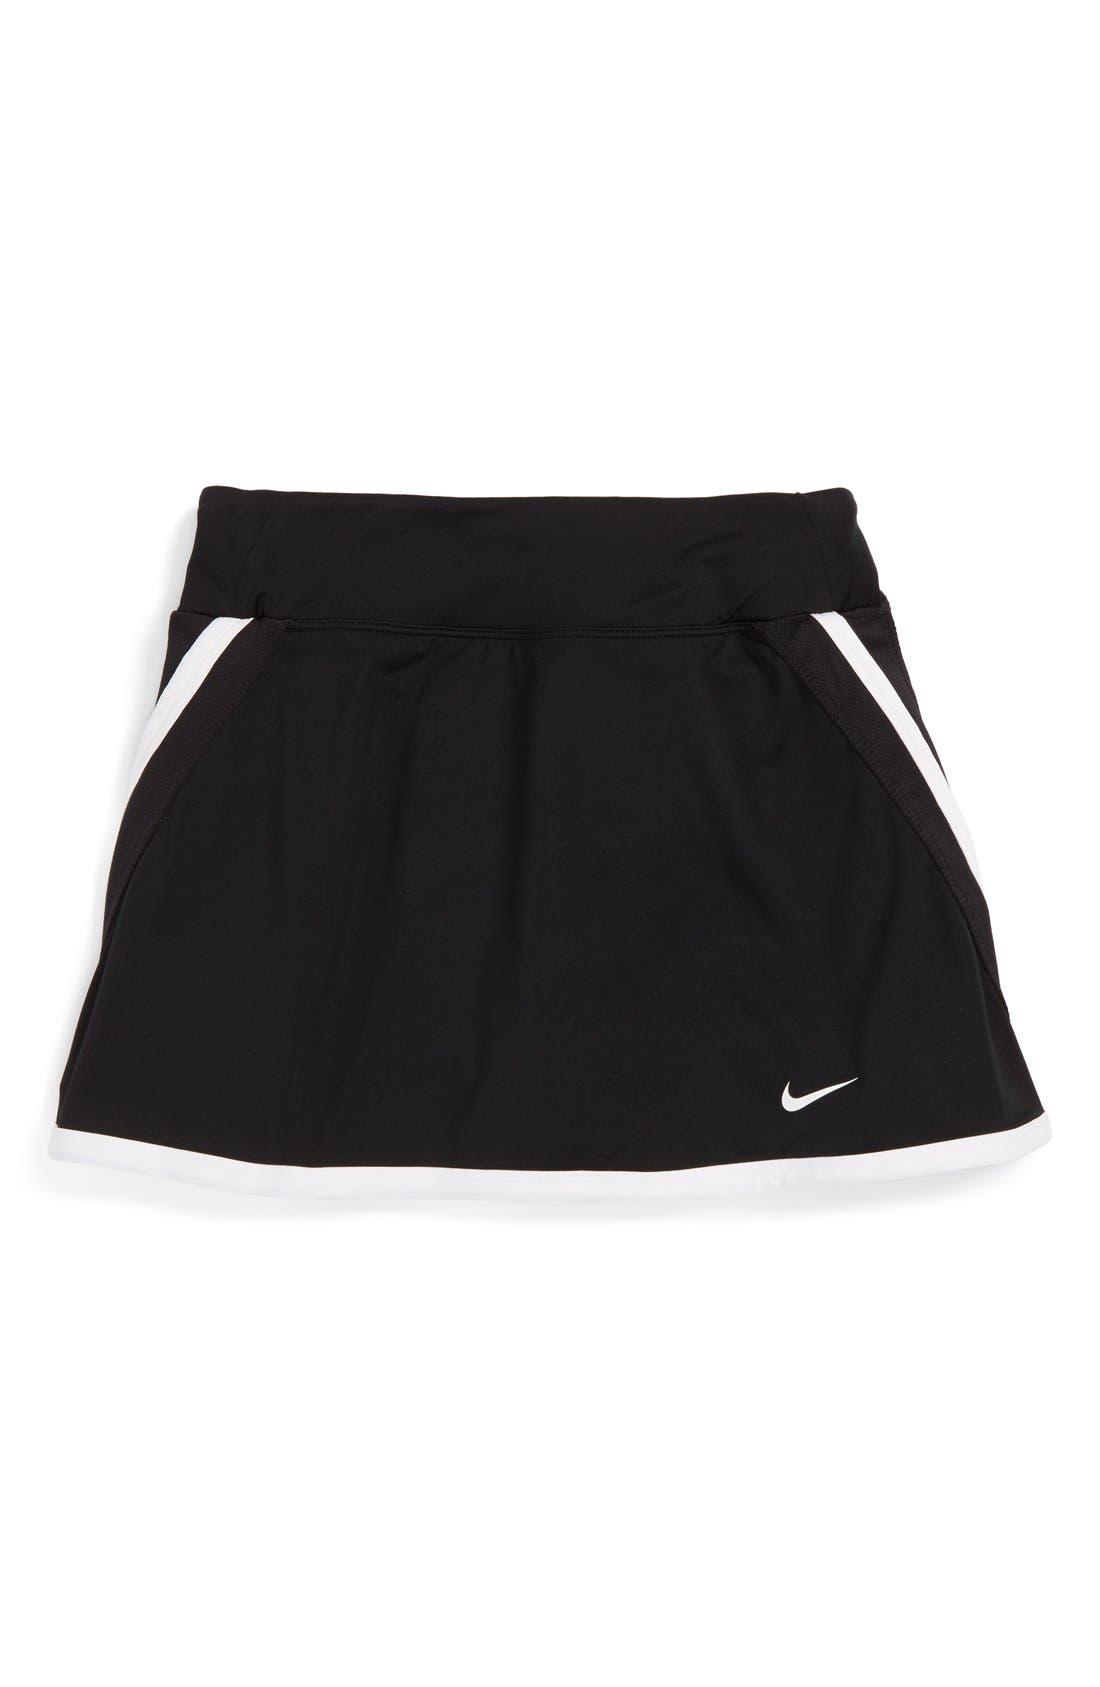 Main Image - Nike 'Power' Dri-FIT Tennis Skirt (Big Girls)